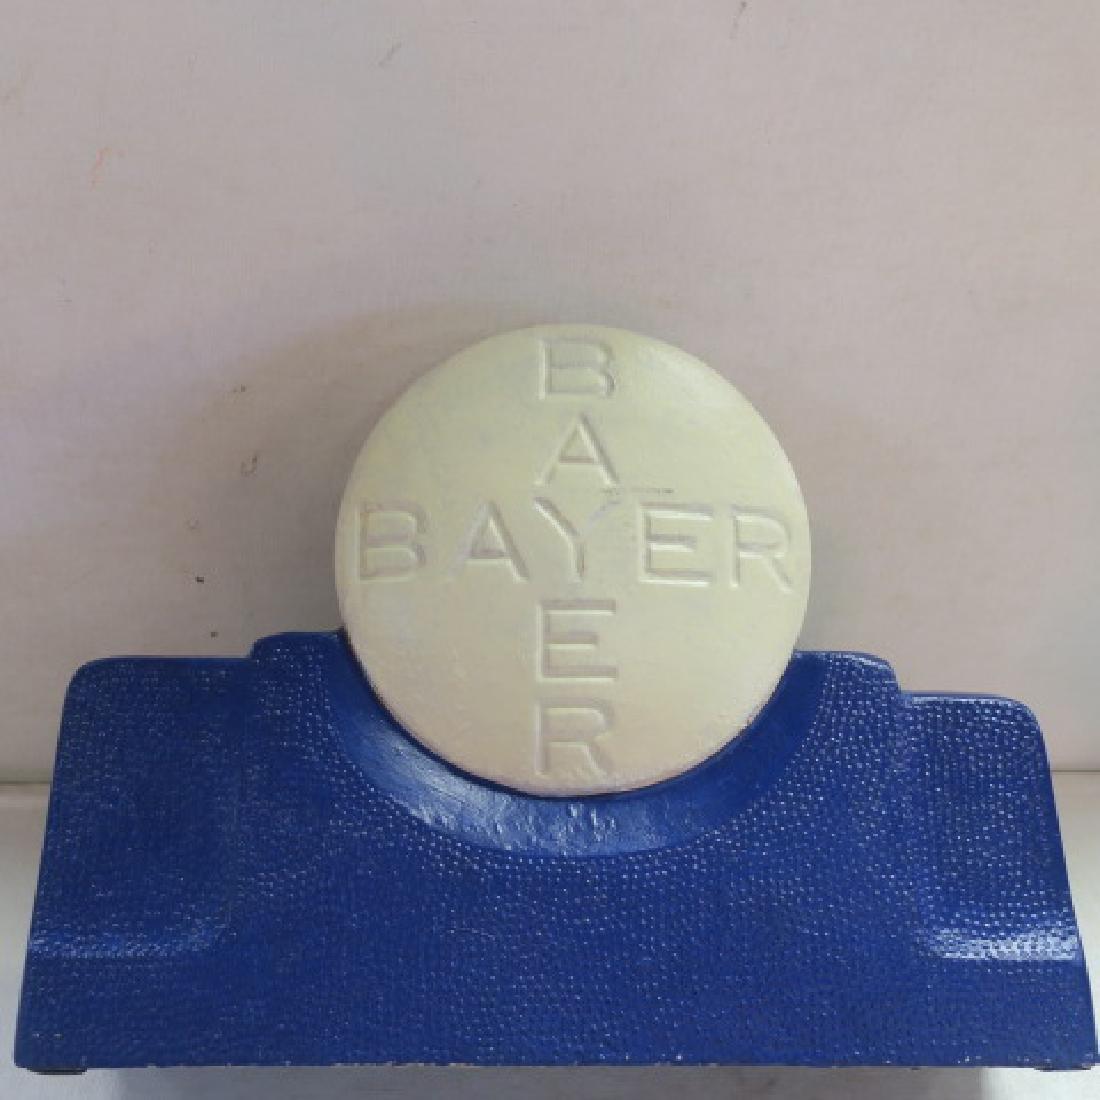 BAYER ASPIRIN Tablets Tin Counter Display: - 3